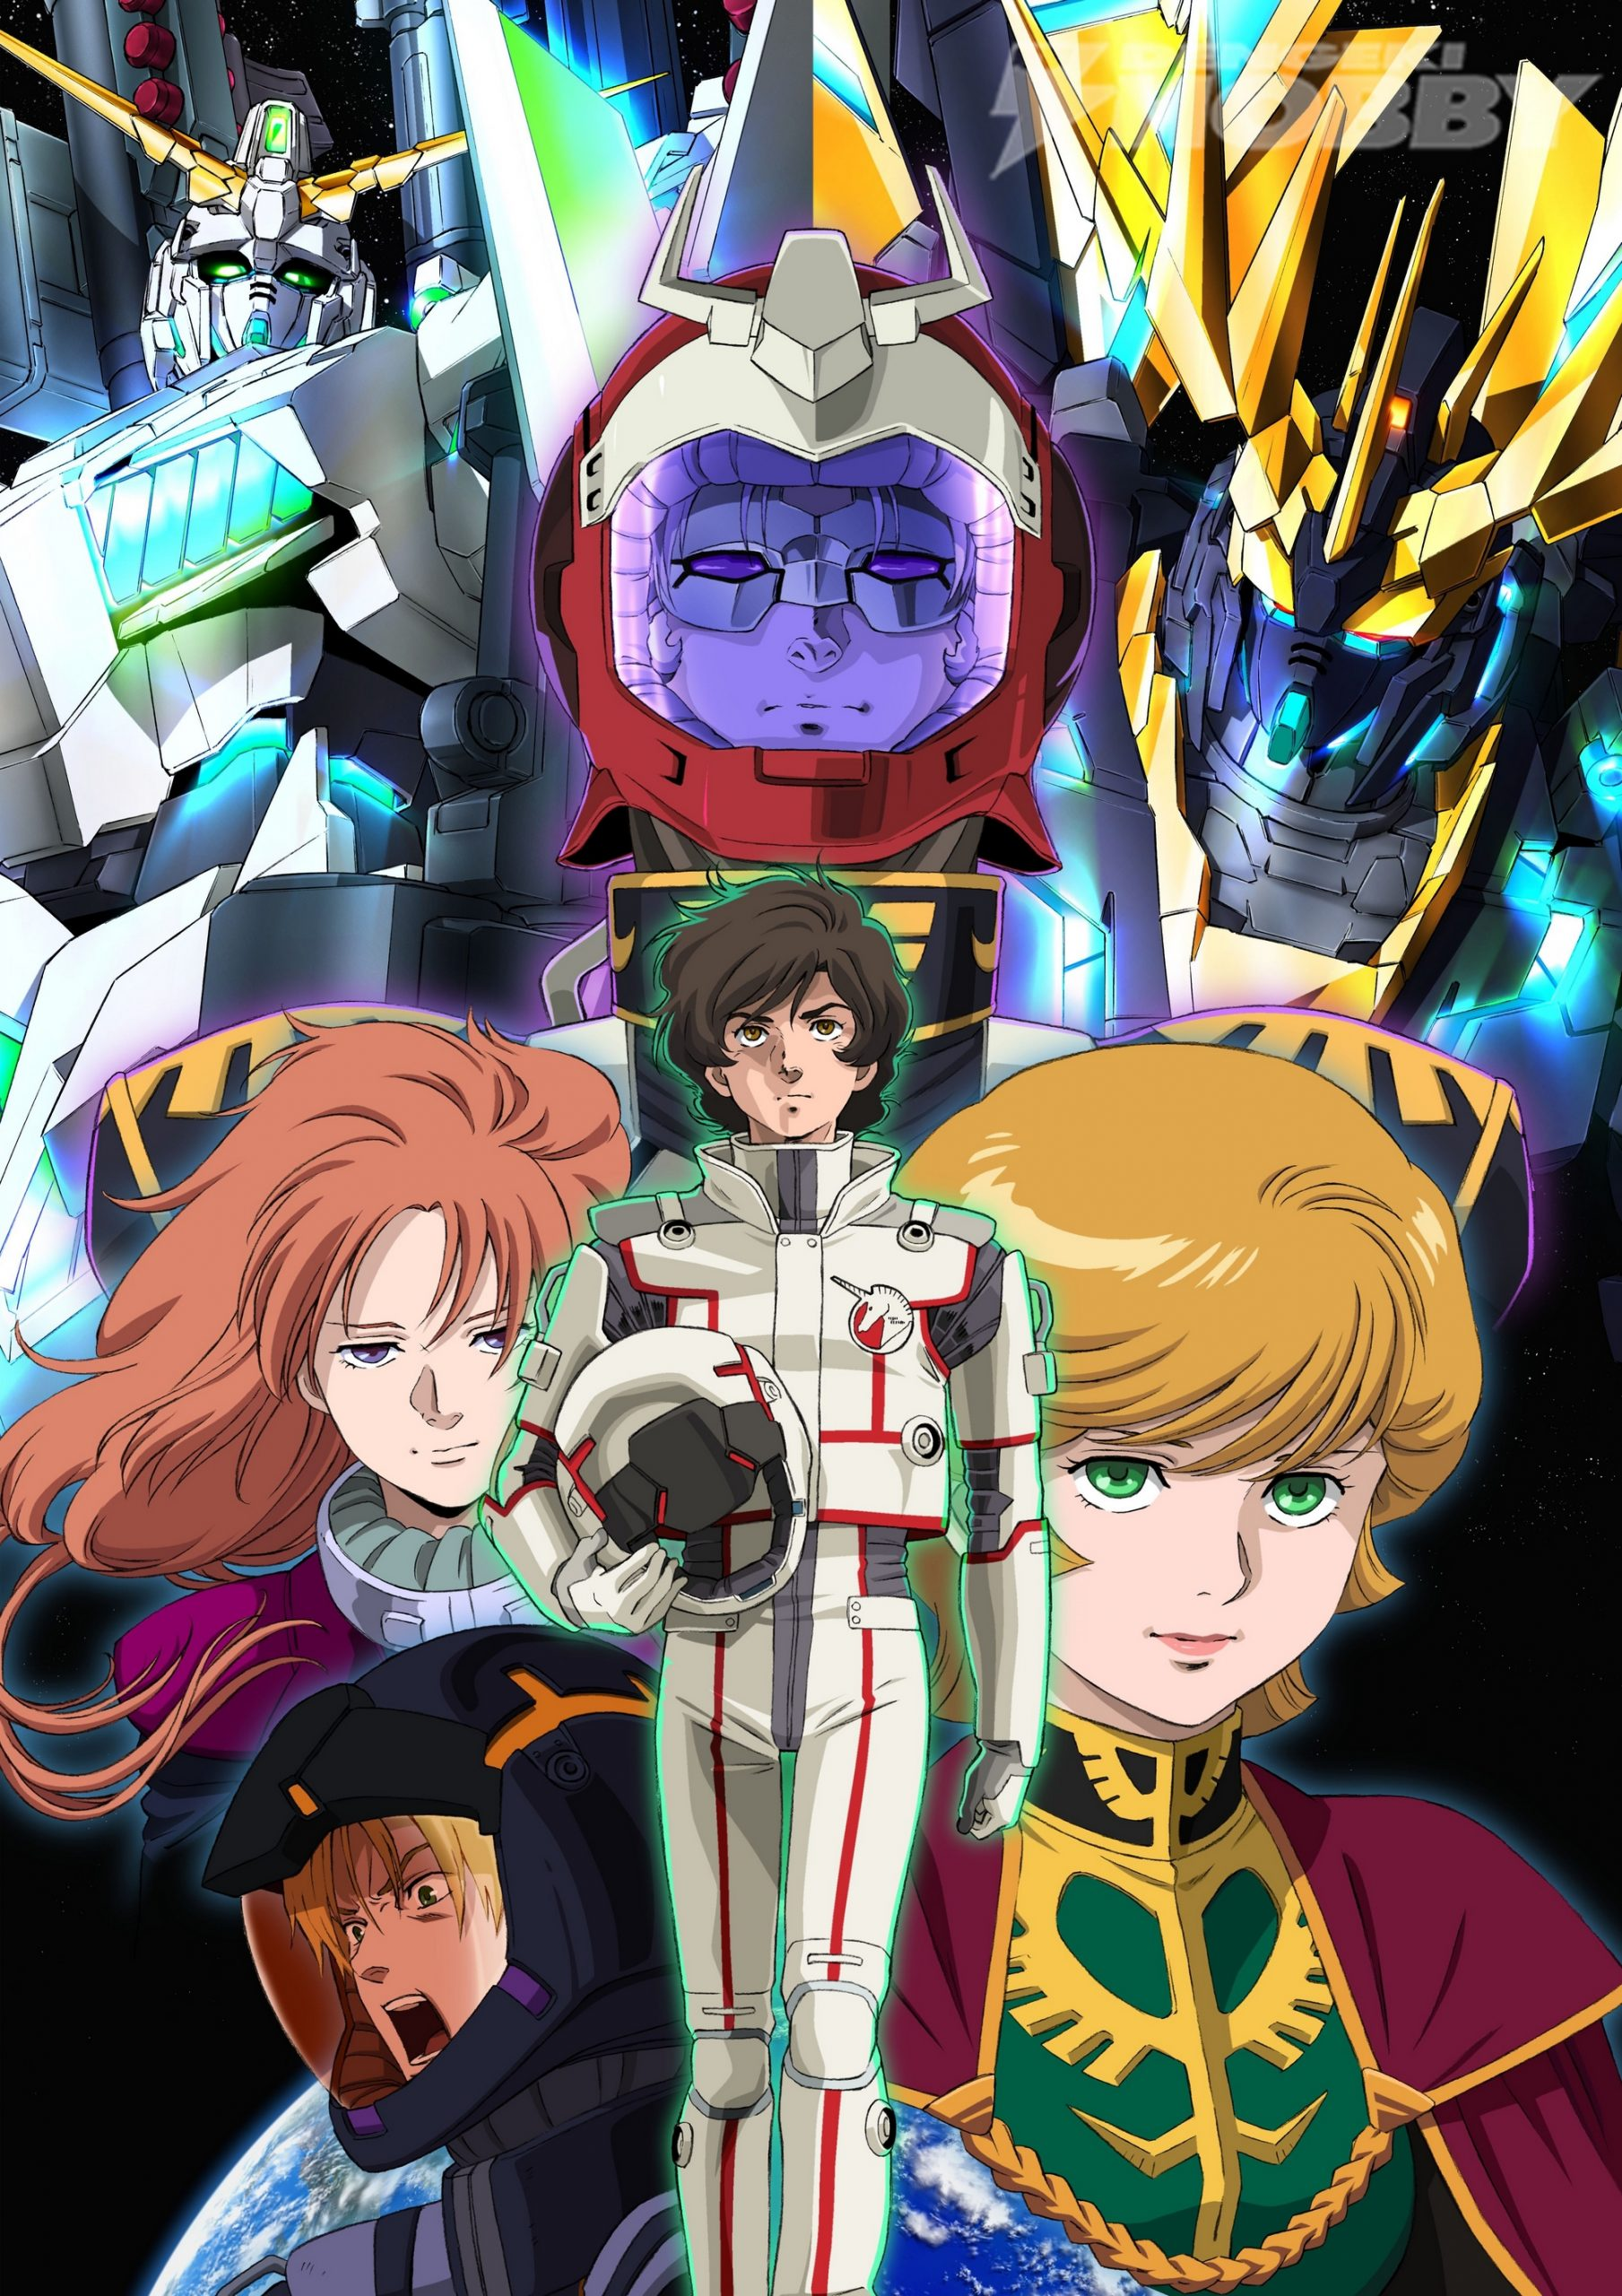 Le studio Sunrise annonce Gundam Narrative, Gundam : Hathaway's Flash et un film live Gundam Unicorn